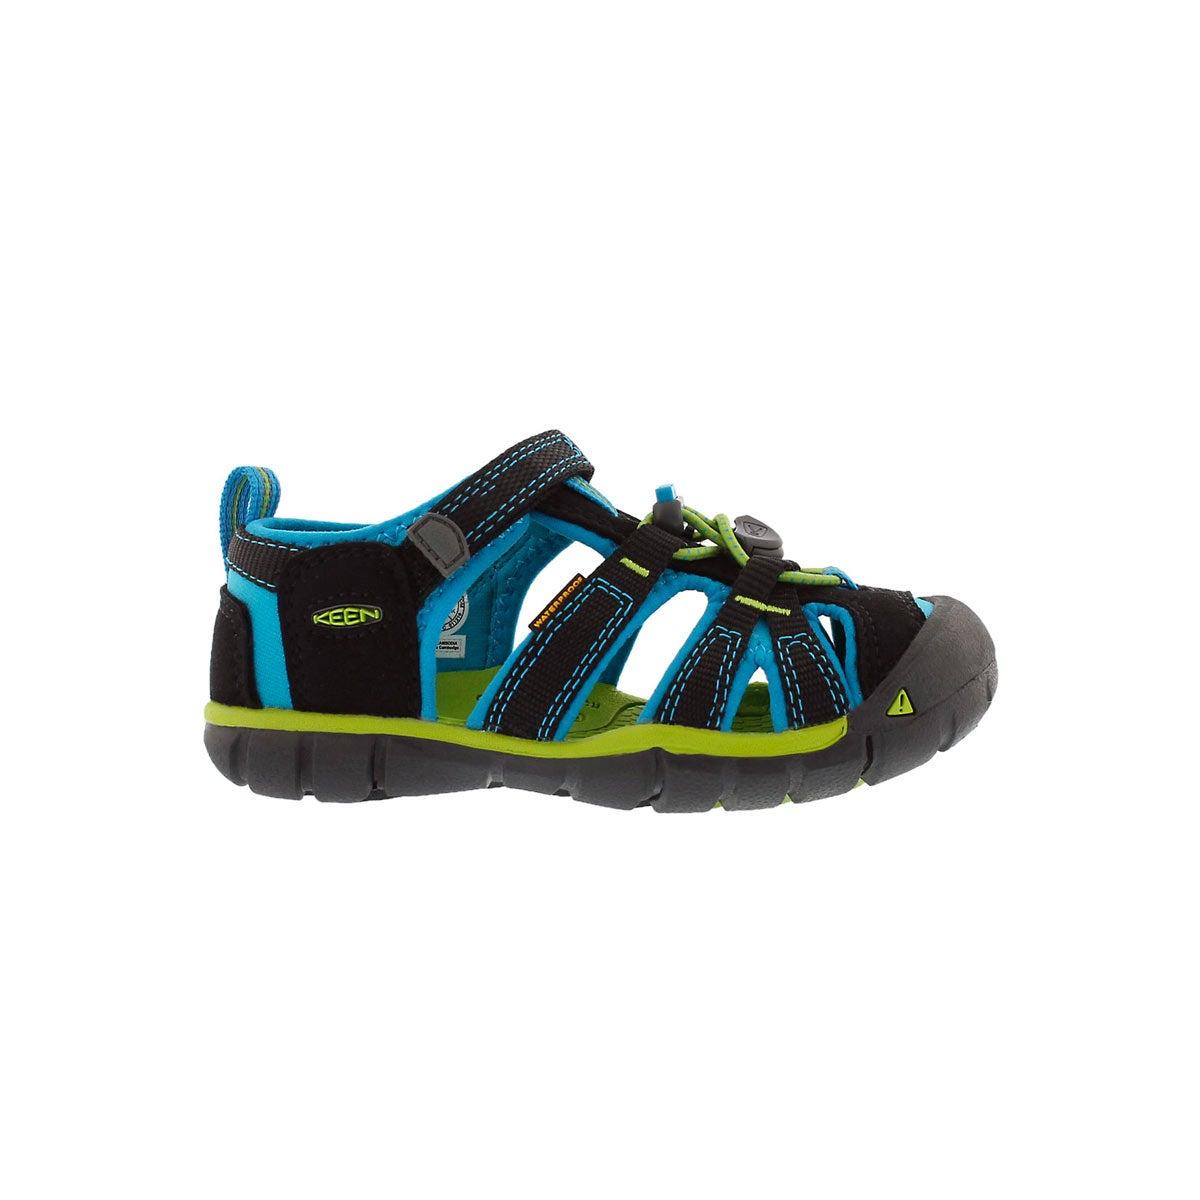 Inf-b Seacamp II black/blue sport sandal